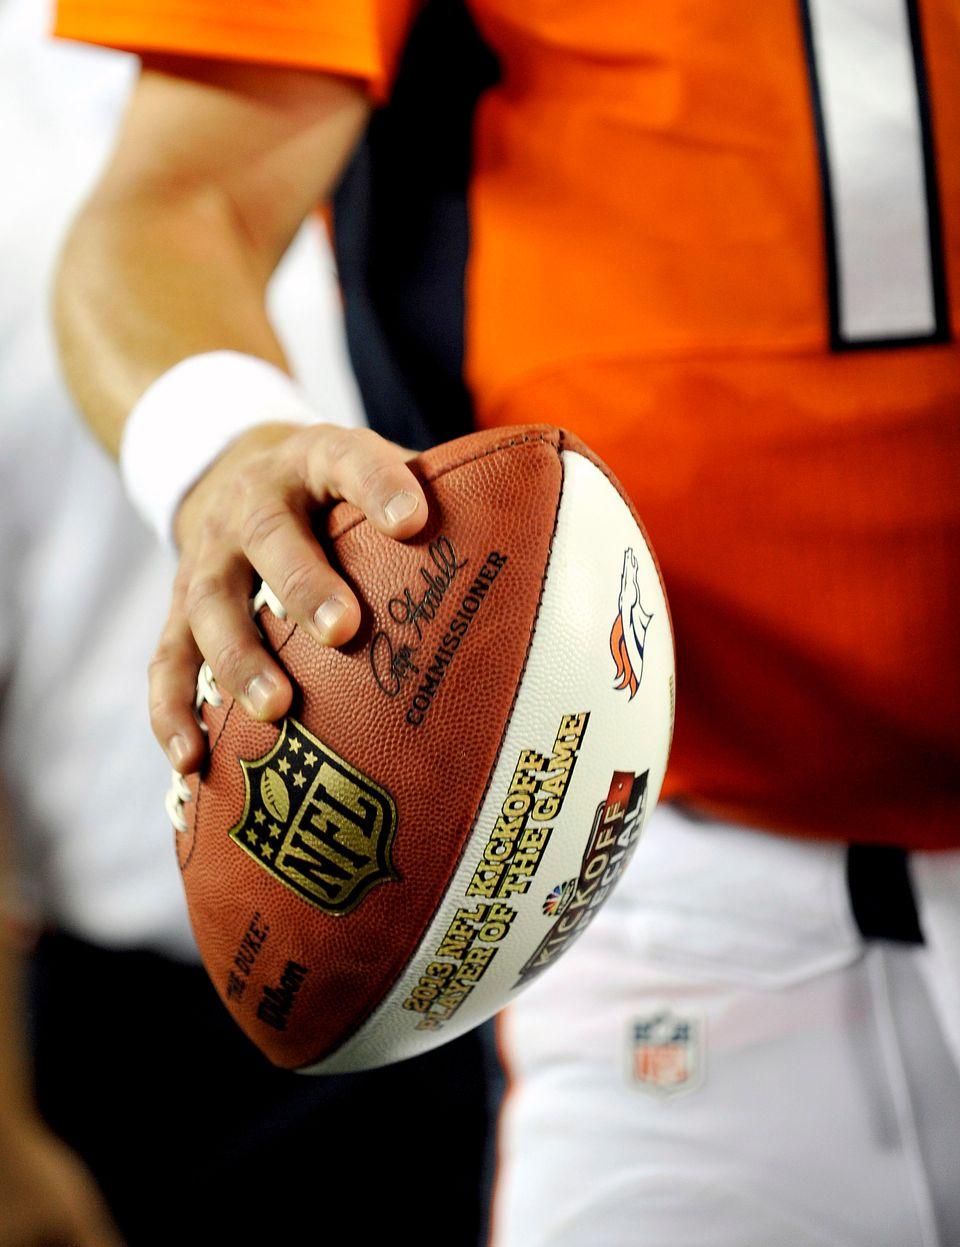 Denver Broncos quarterback Peyton Manning holds the game ball after an NFL football game against the Baltimore Ravens, Thursd